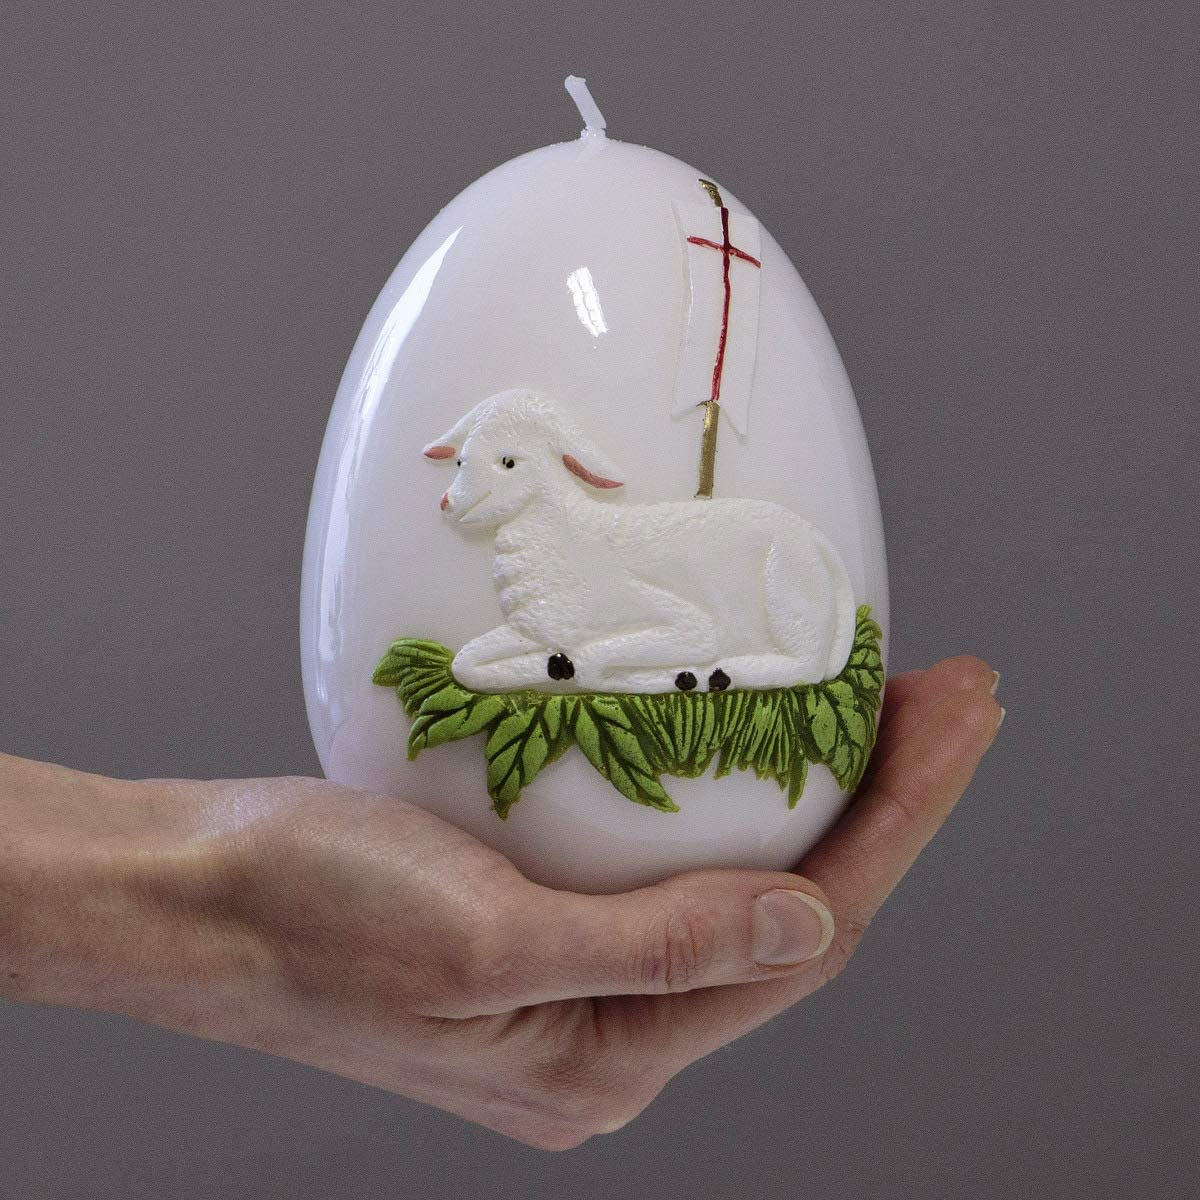 holzalbum Osterkerze Osterei Osterlamm /Ø 10 x 14 cm Agnus Dei Ostermotiv 3D Wachsmotiv Ei